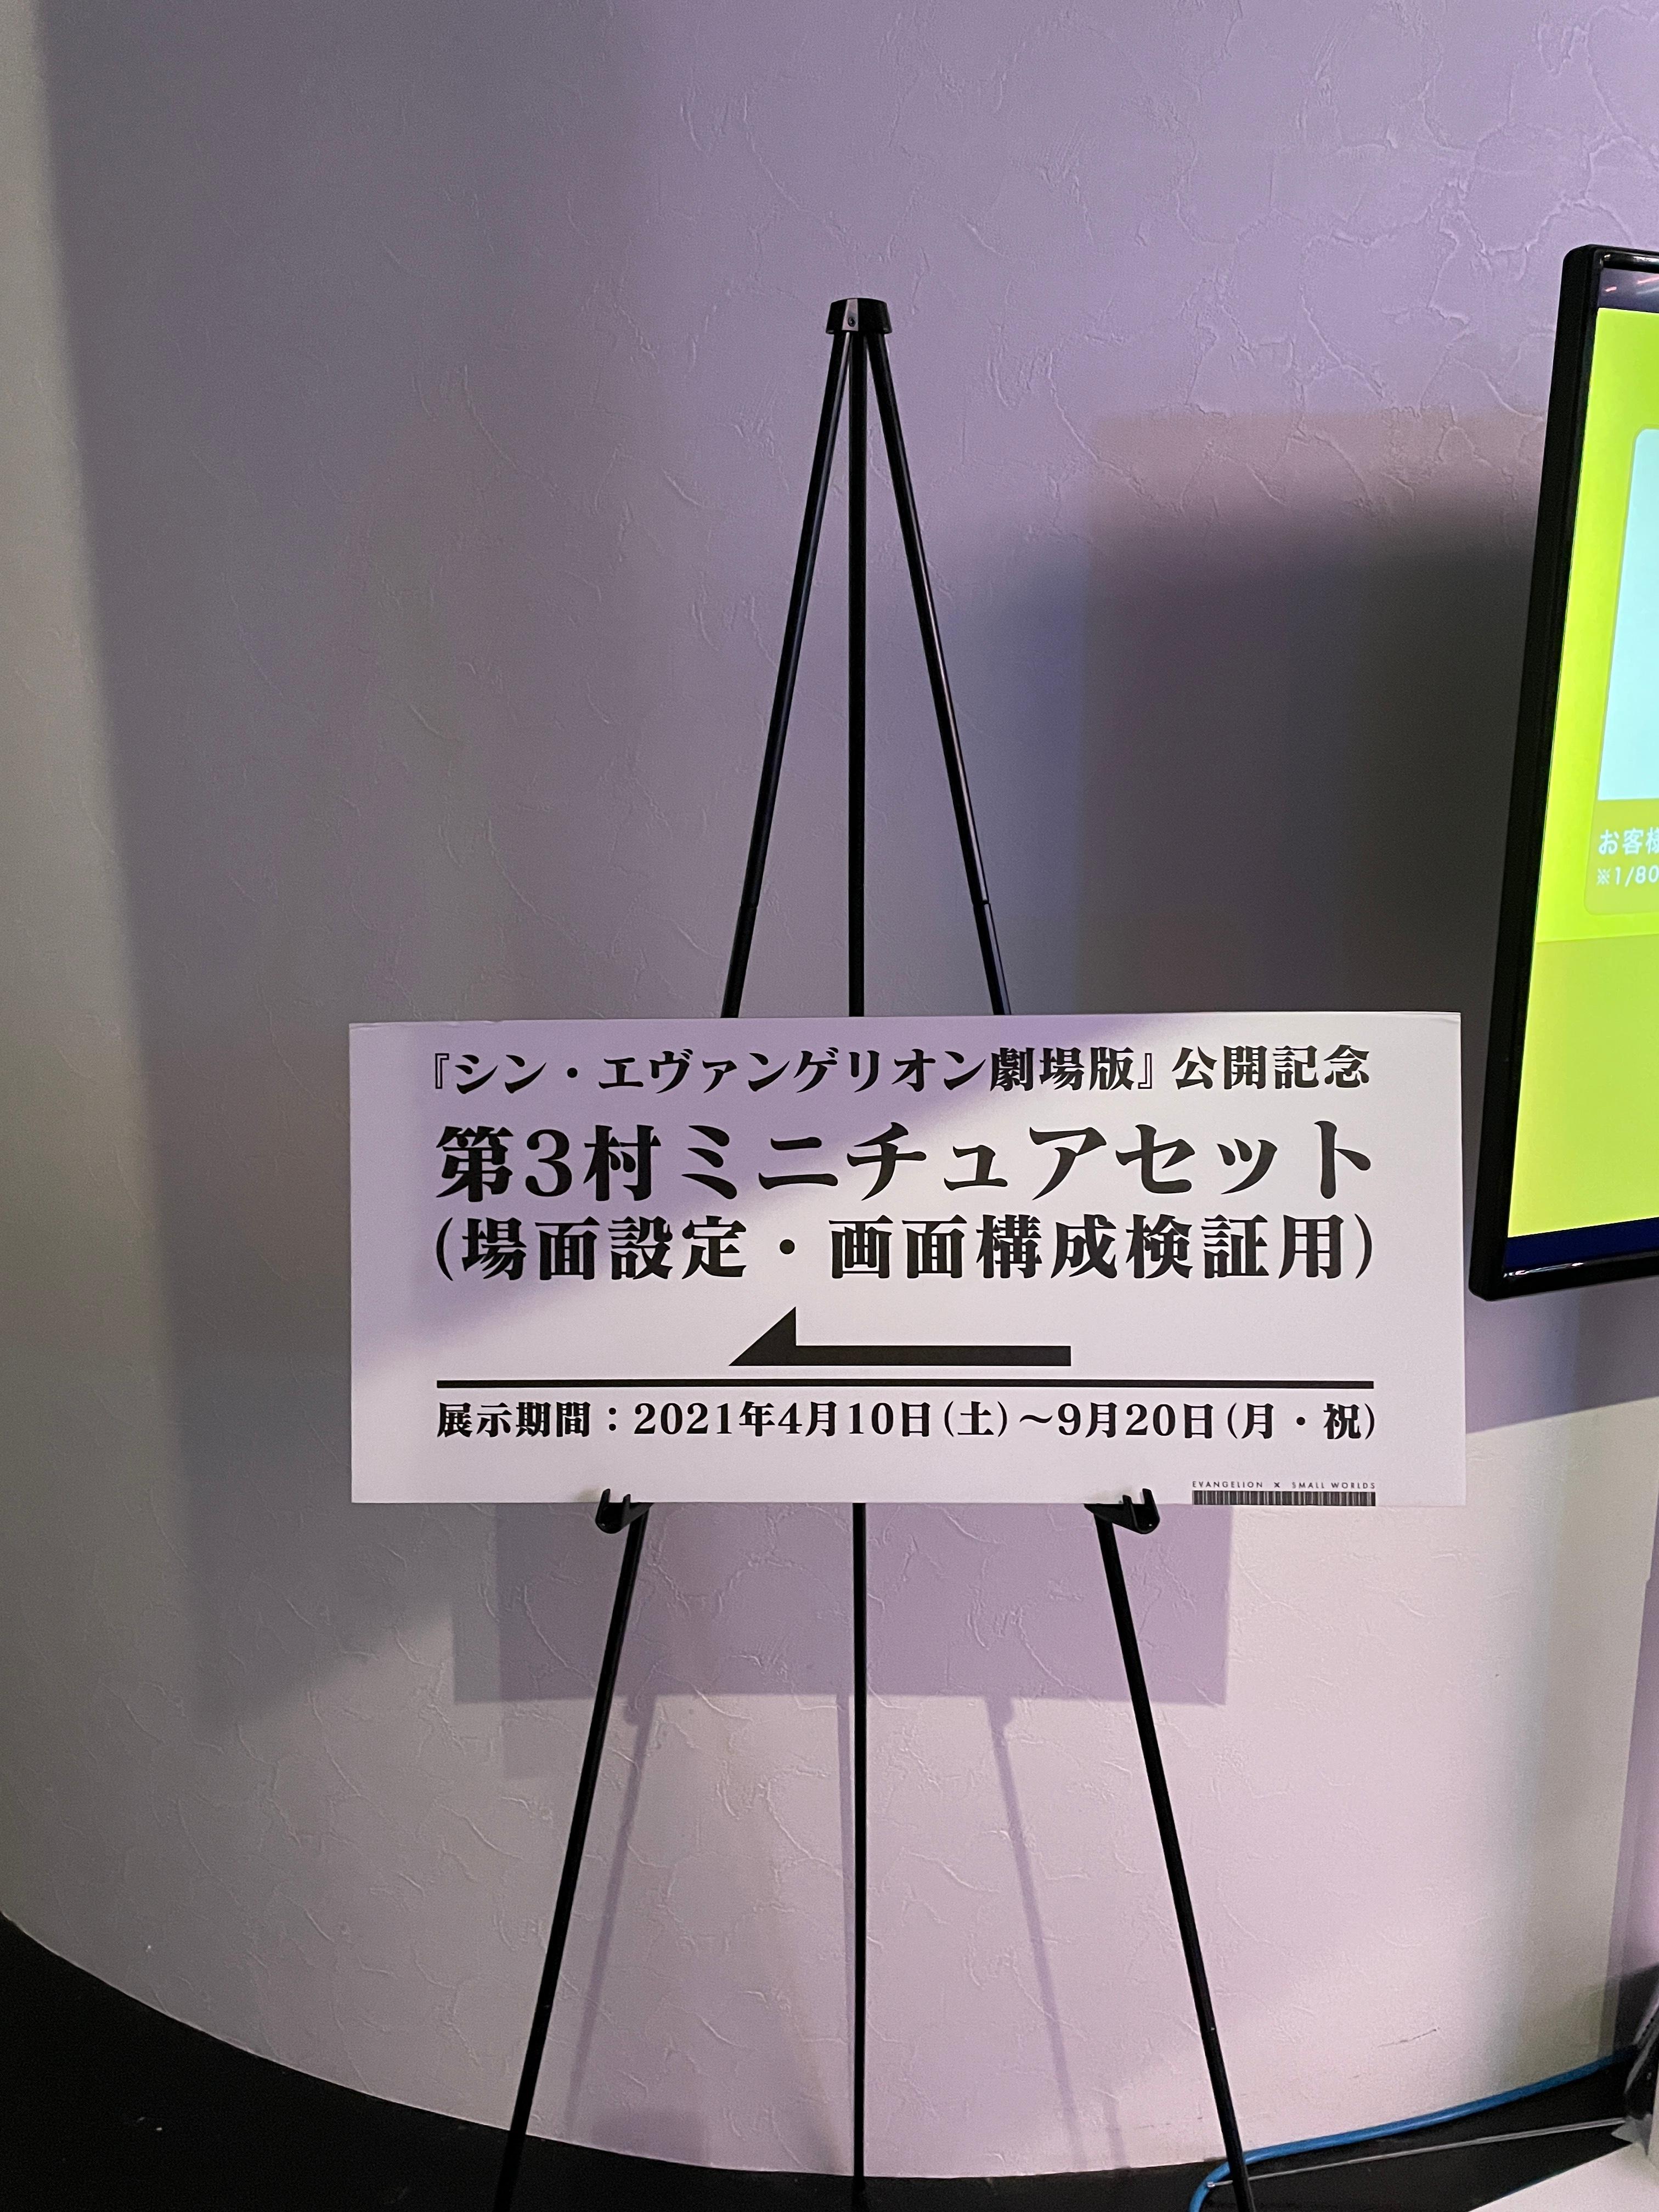 Small World Tokyo 新世纪福音战士新剧场版:终 第三村